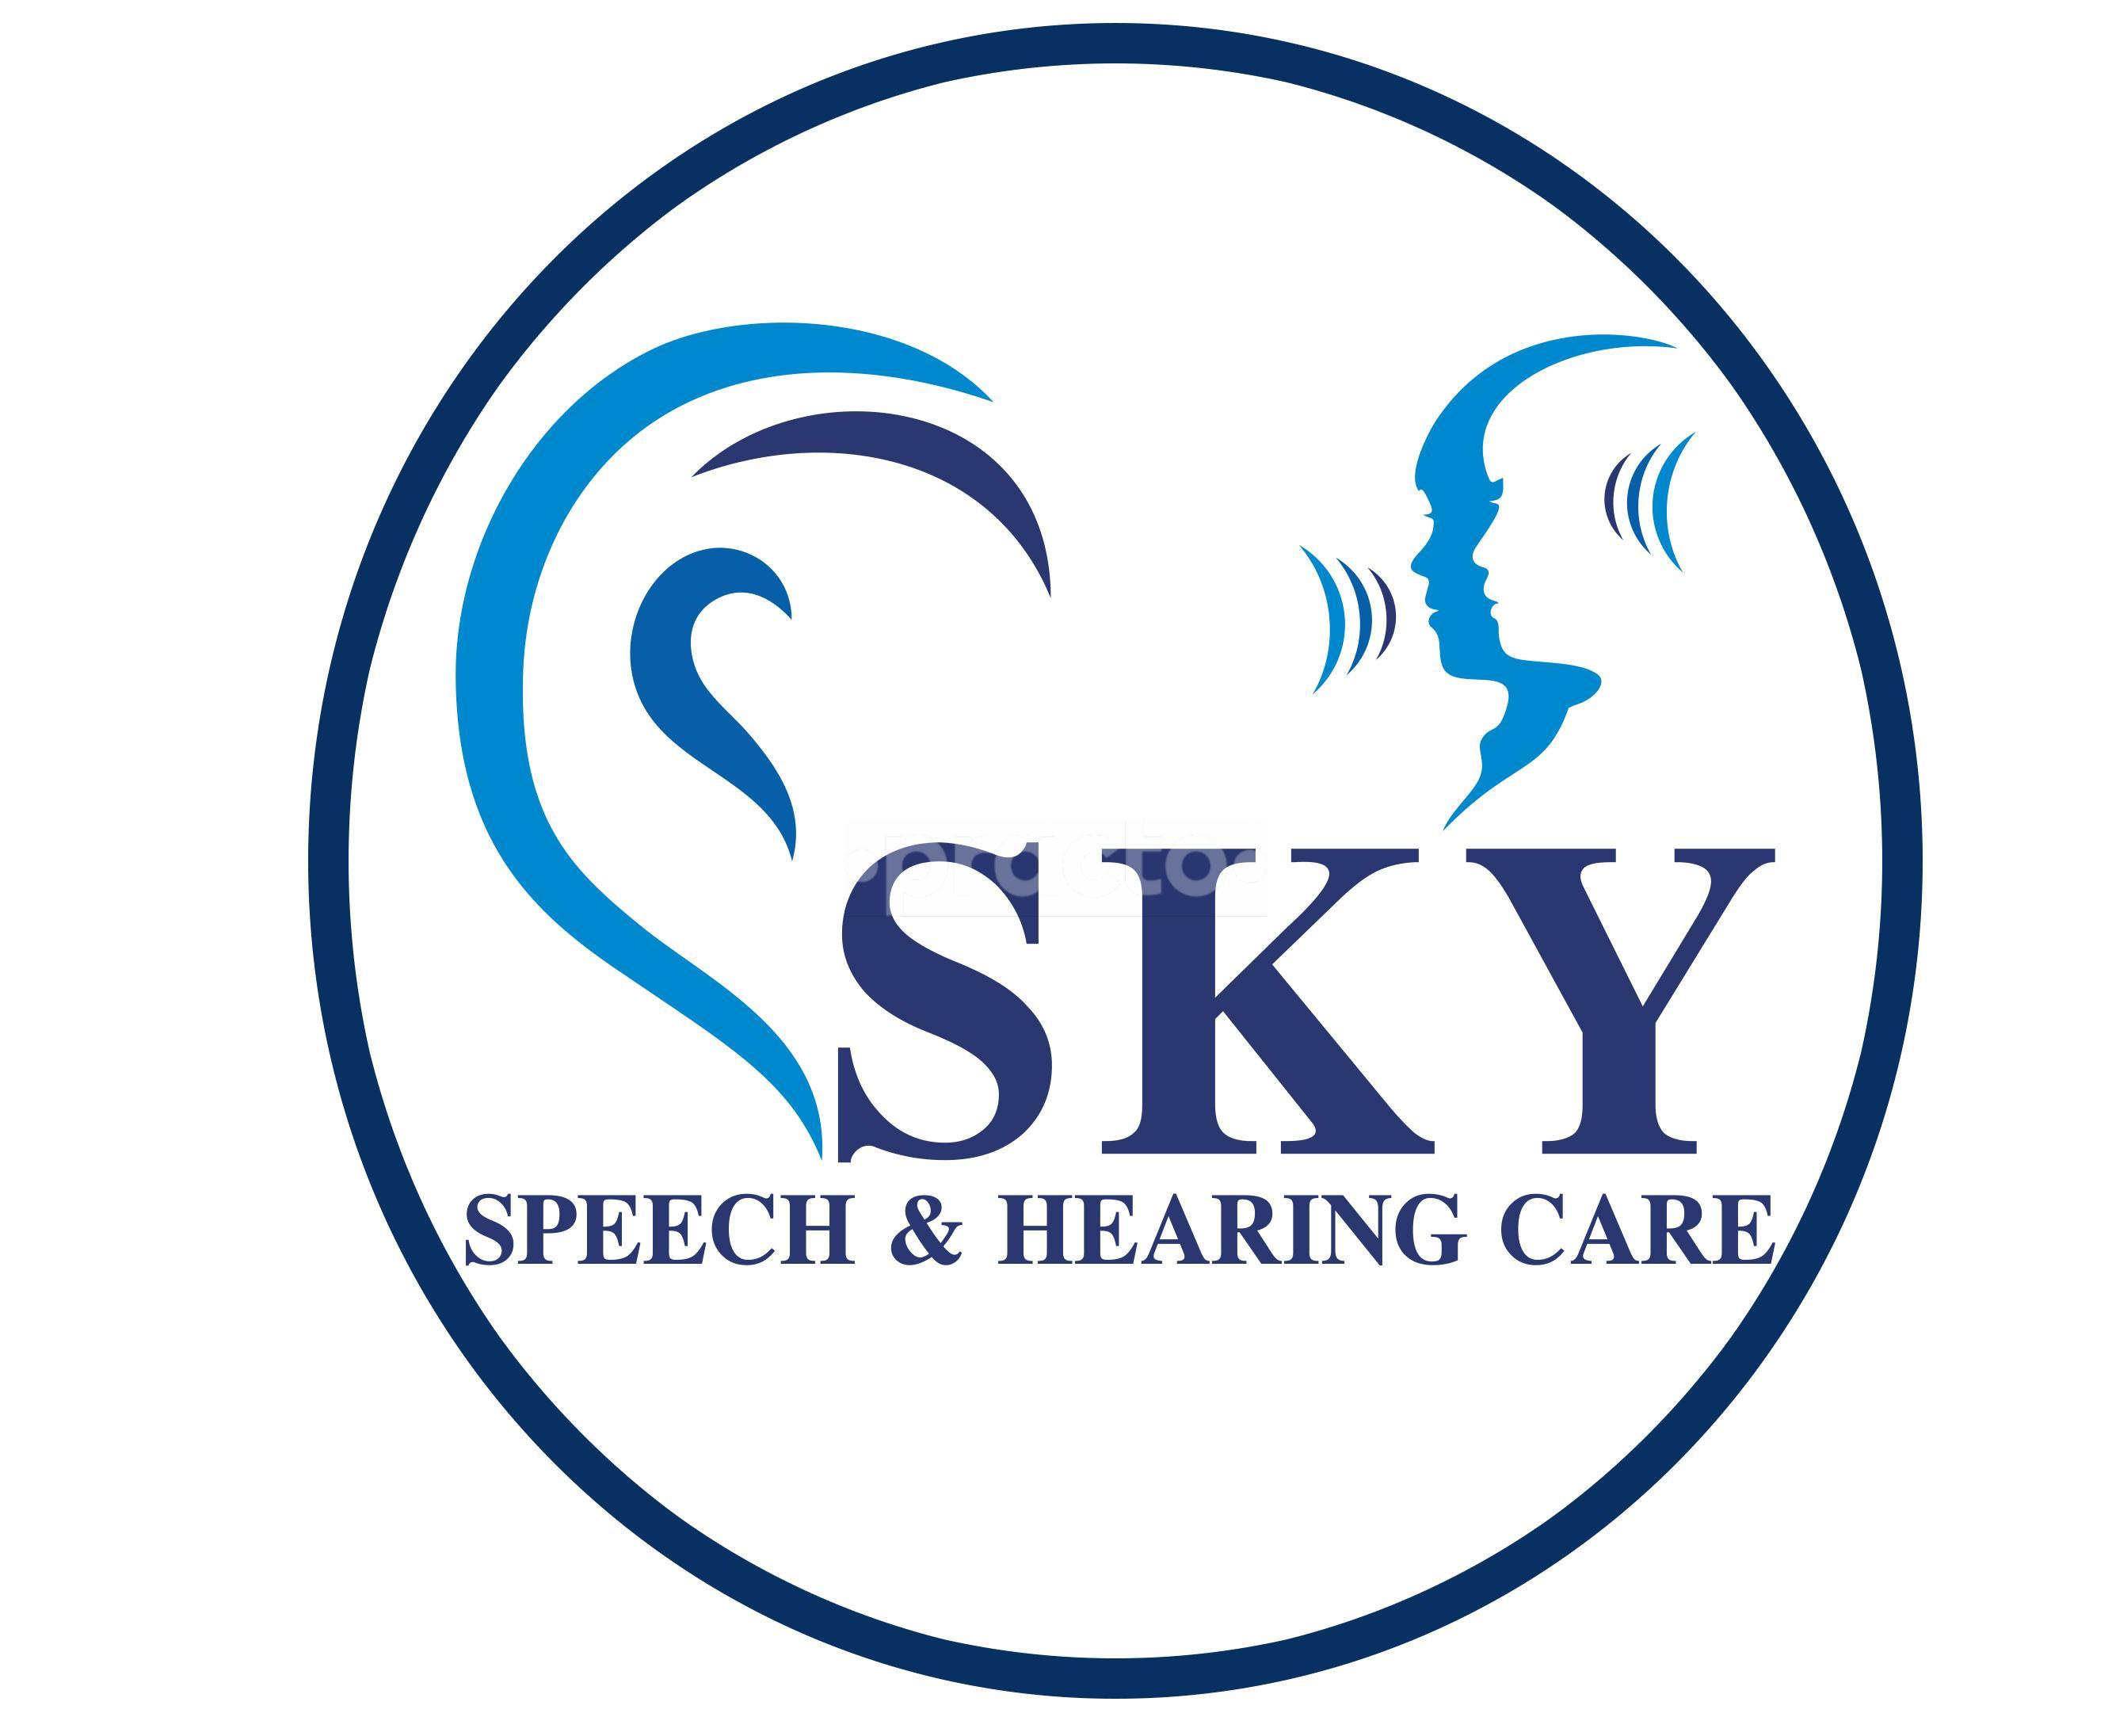 Sky Speech & Hearing Care